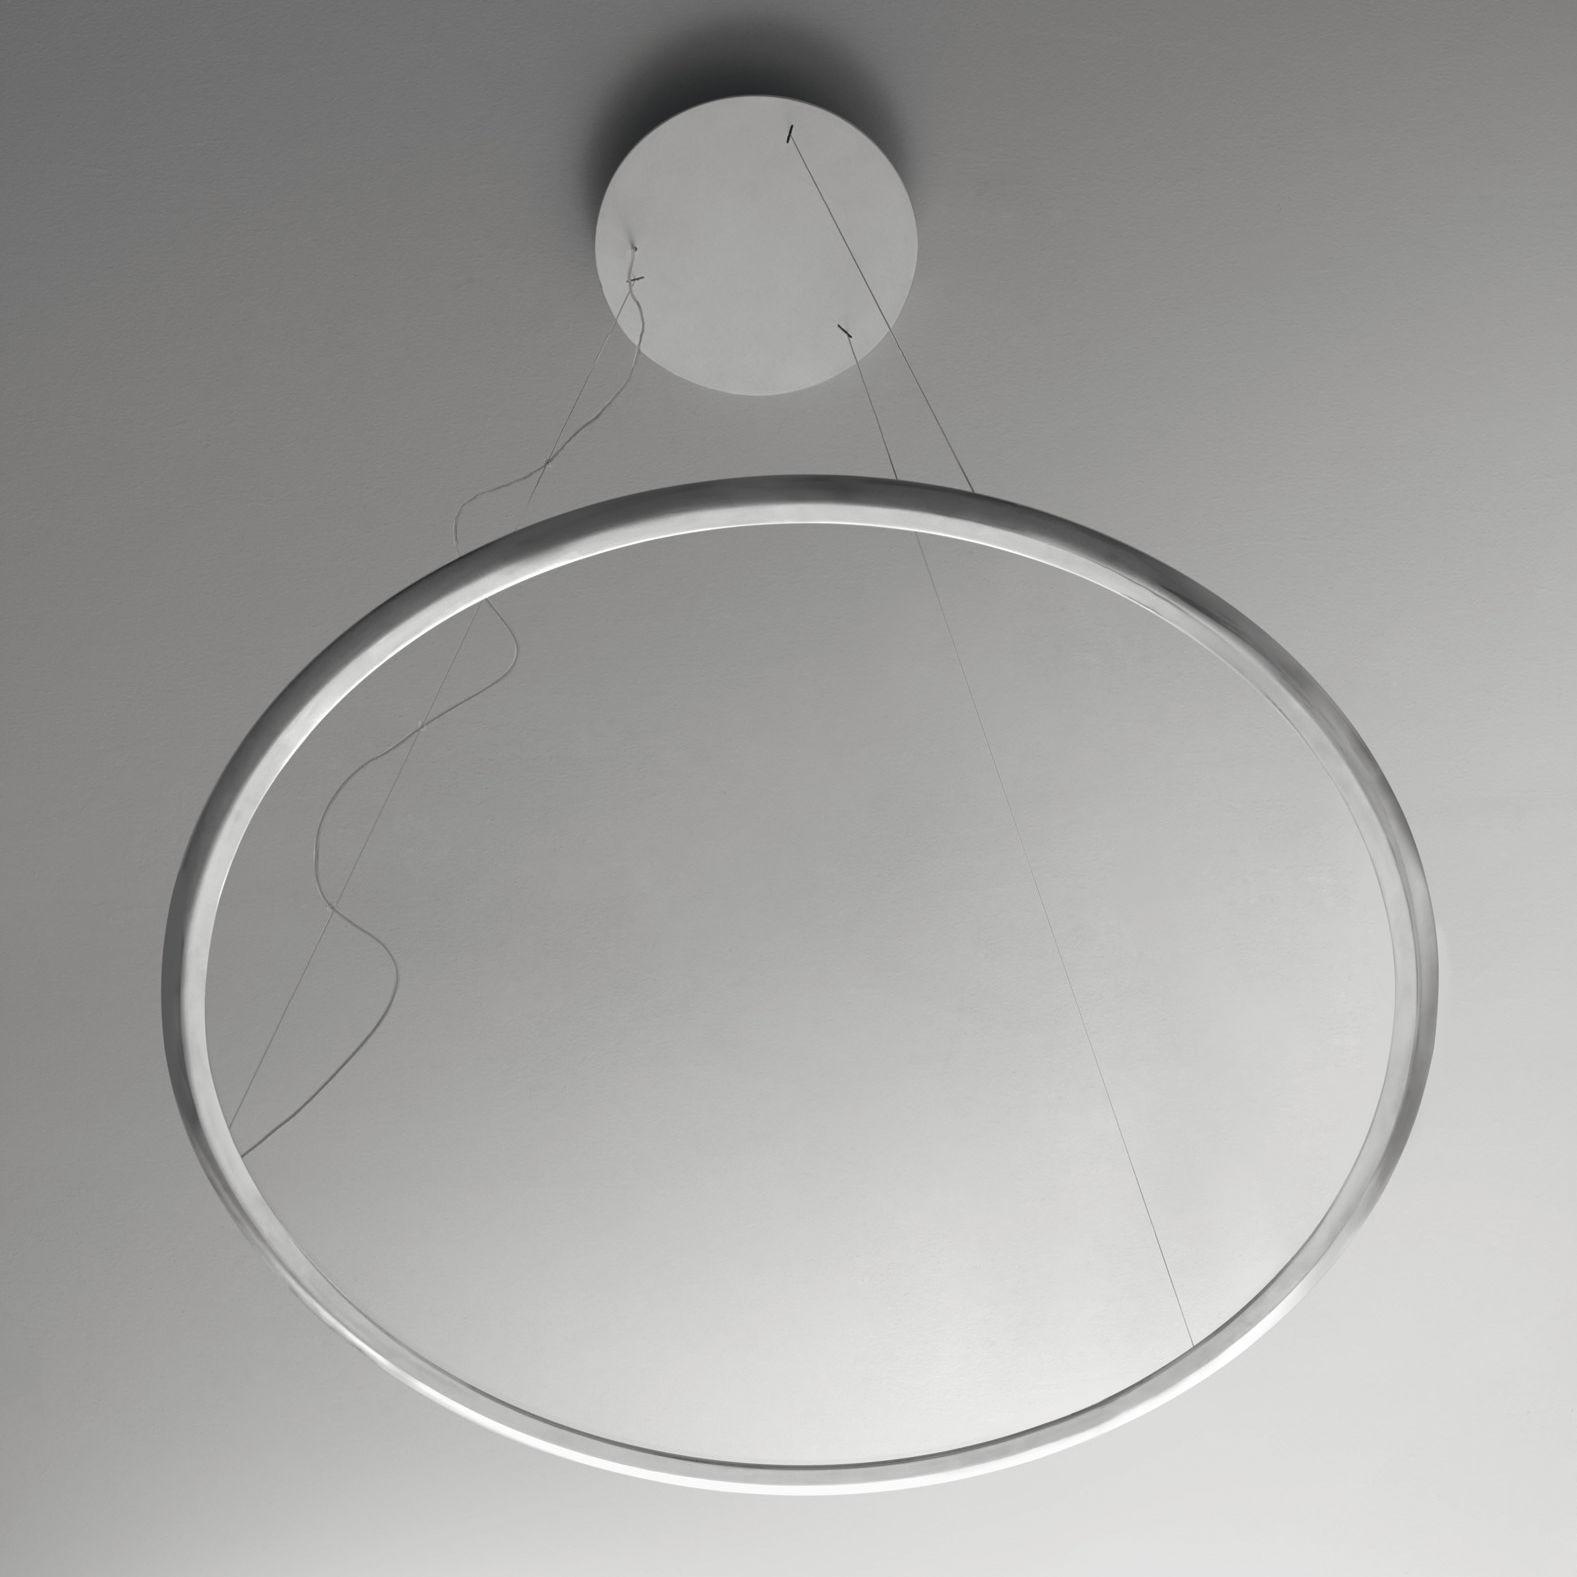 Leuchten - Pendelleuchten - Discovery LED Pendelleuchte / Ø 70 cm - Artemide - Scheibe transparent / Rahmen Aluminium - Aluminium, PMMA